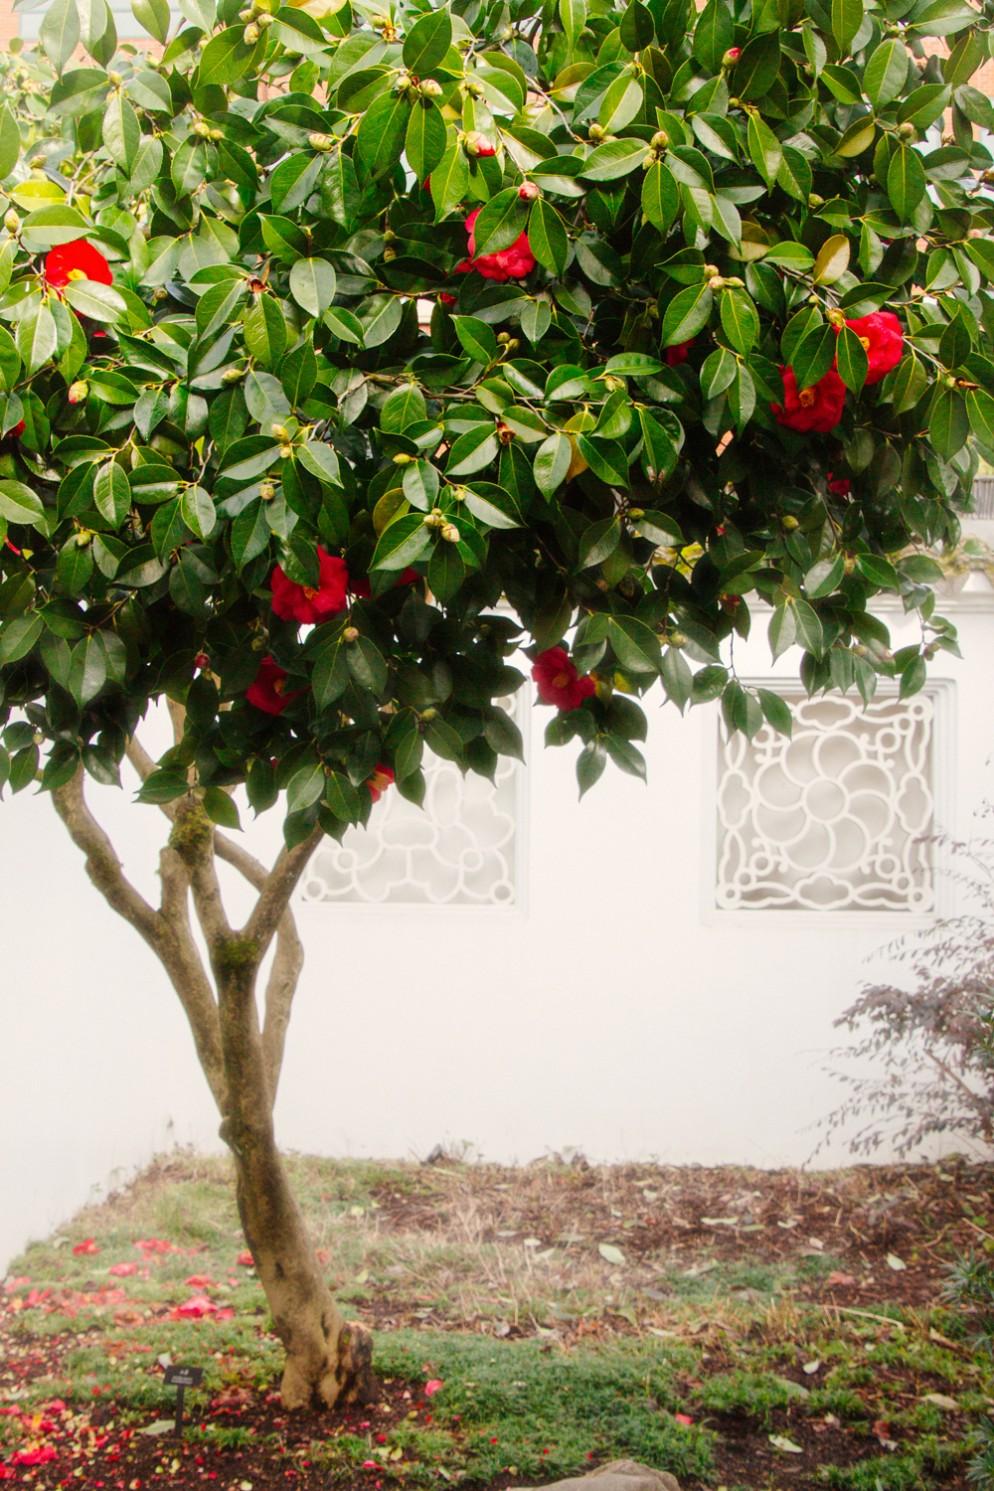 alberi-da-giardino-sempreverdi-4. eric-muhr-gY_klDgAej8-unsplashliving-corriere